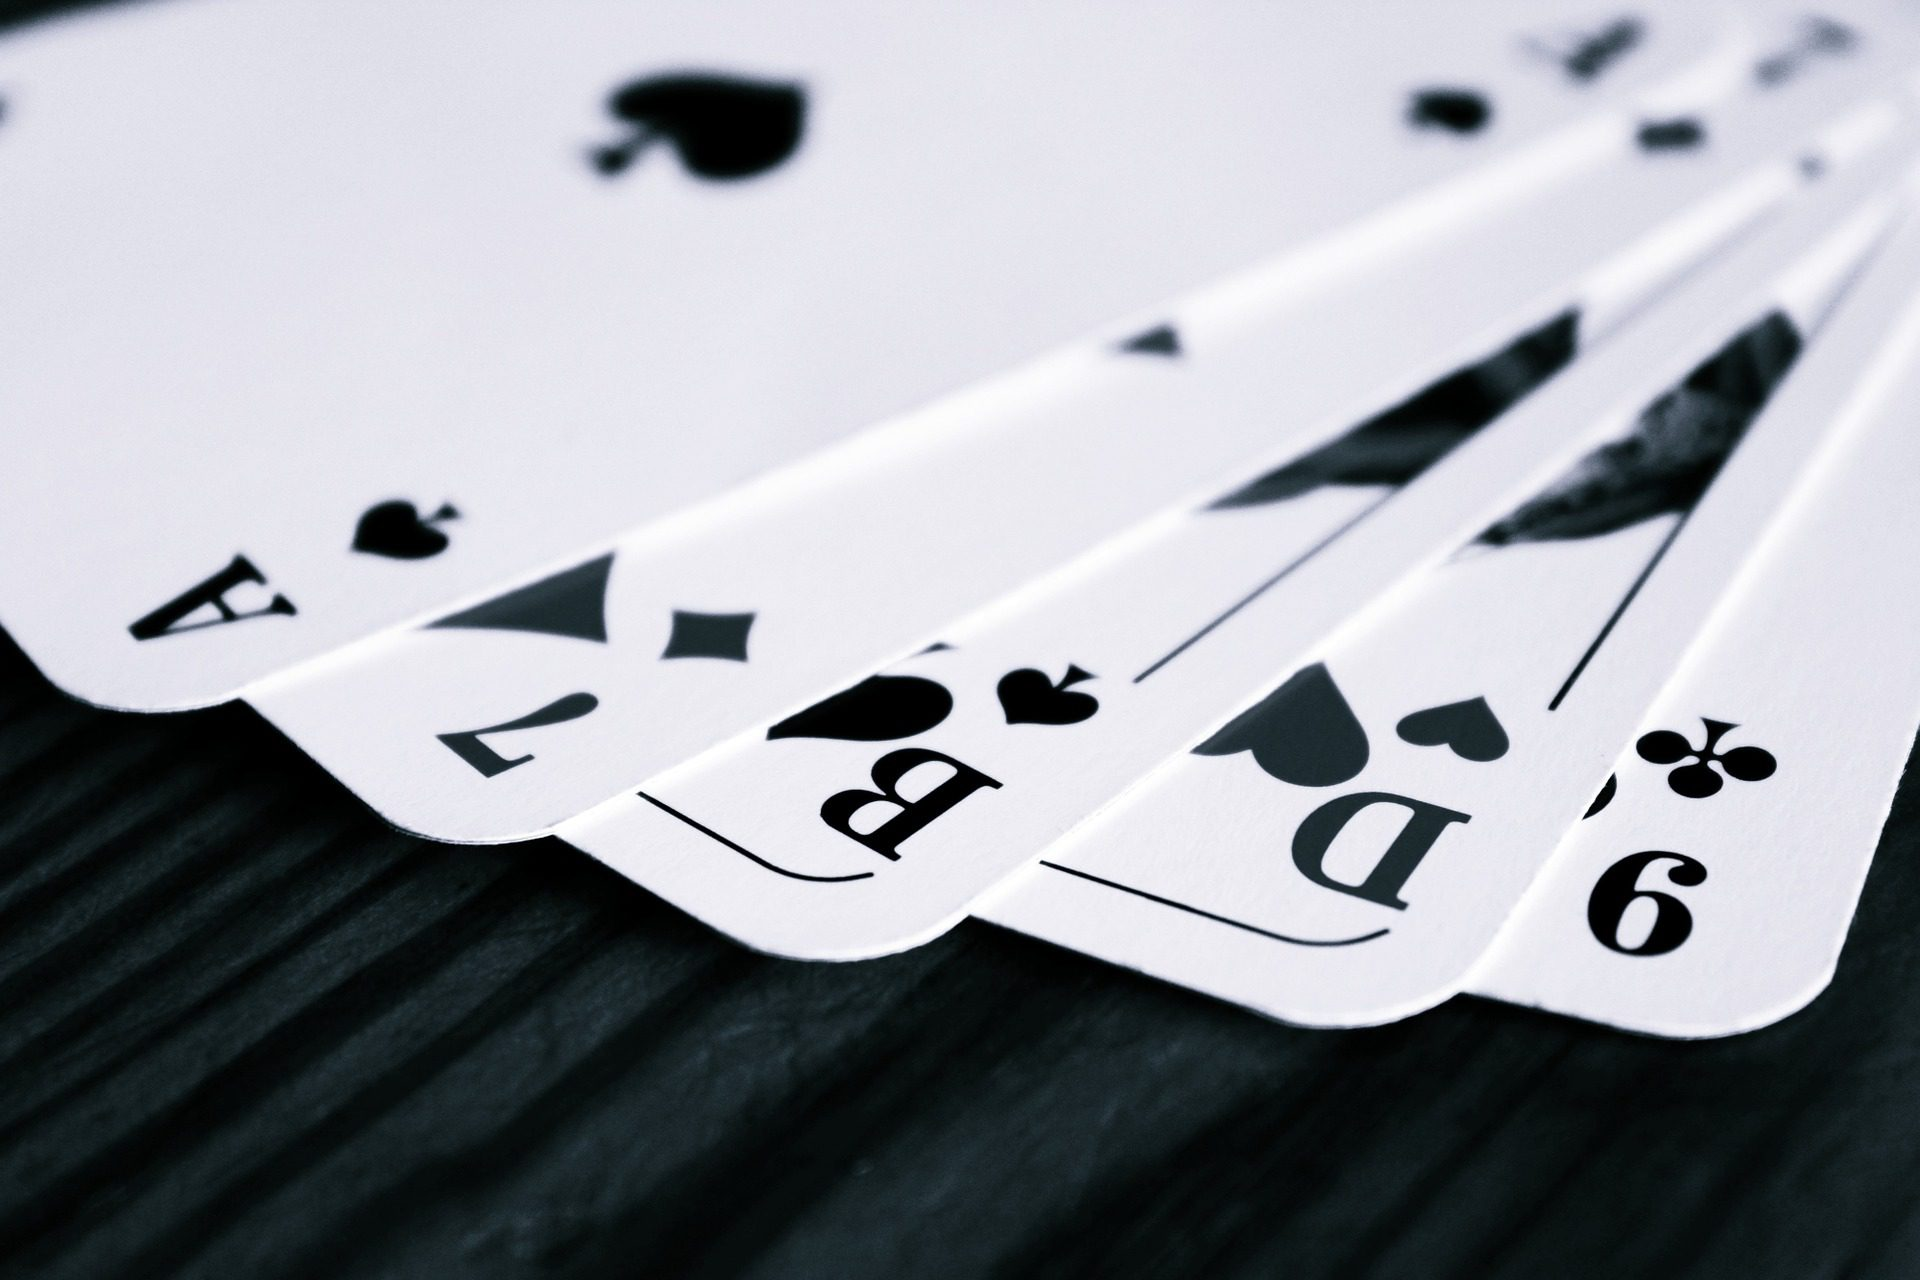 Pokerspiel in tollem Ambiente